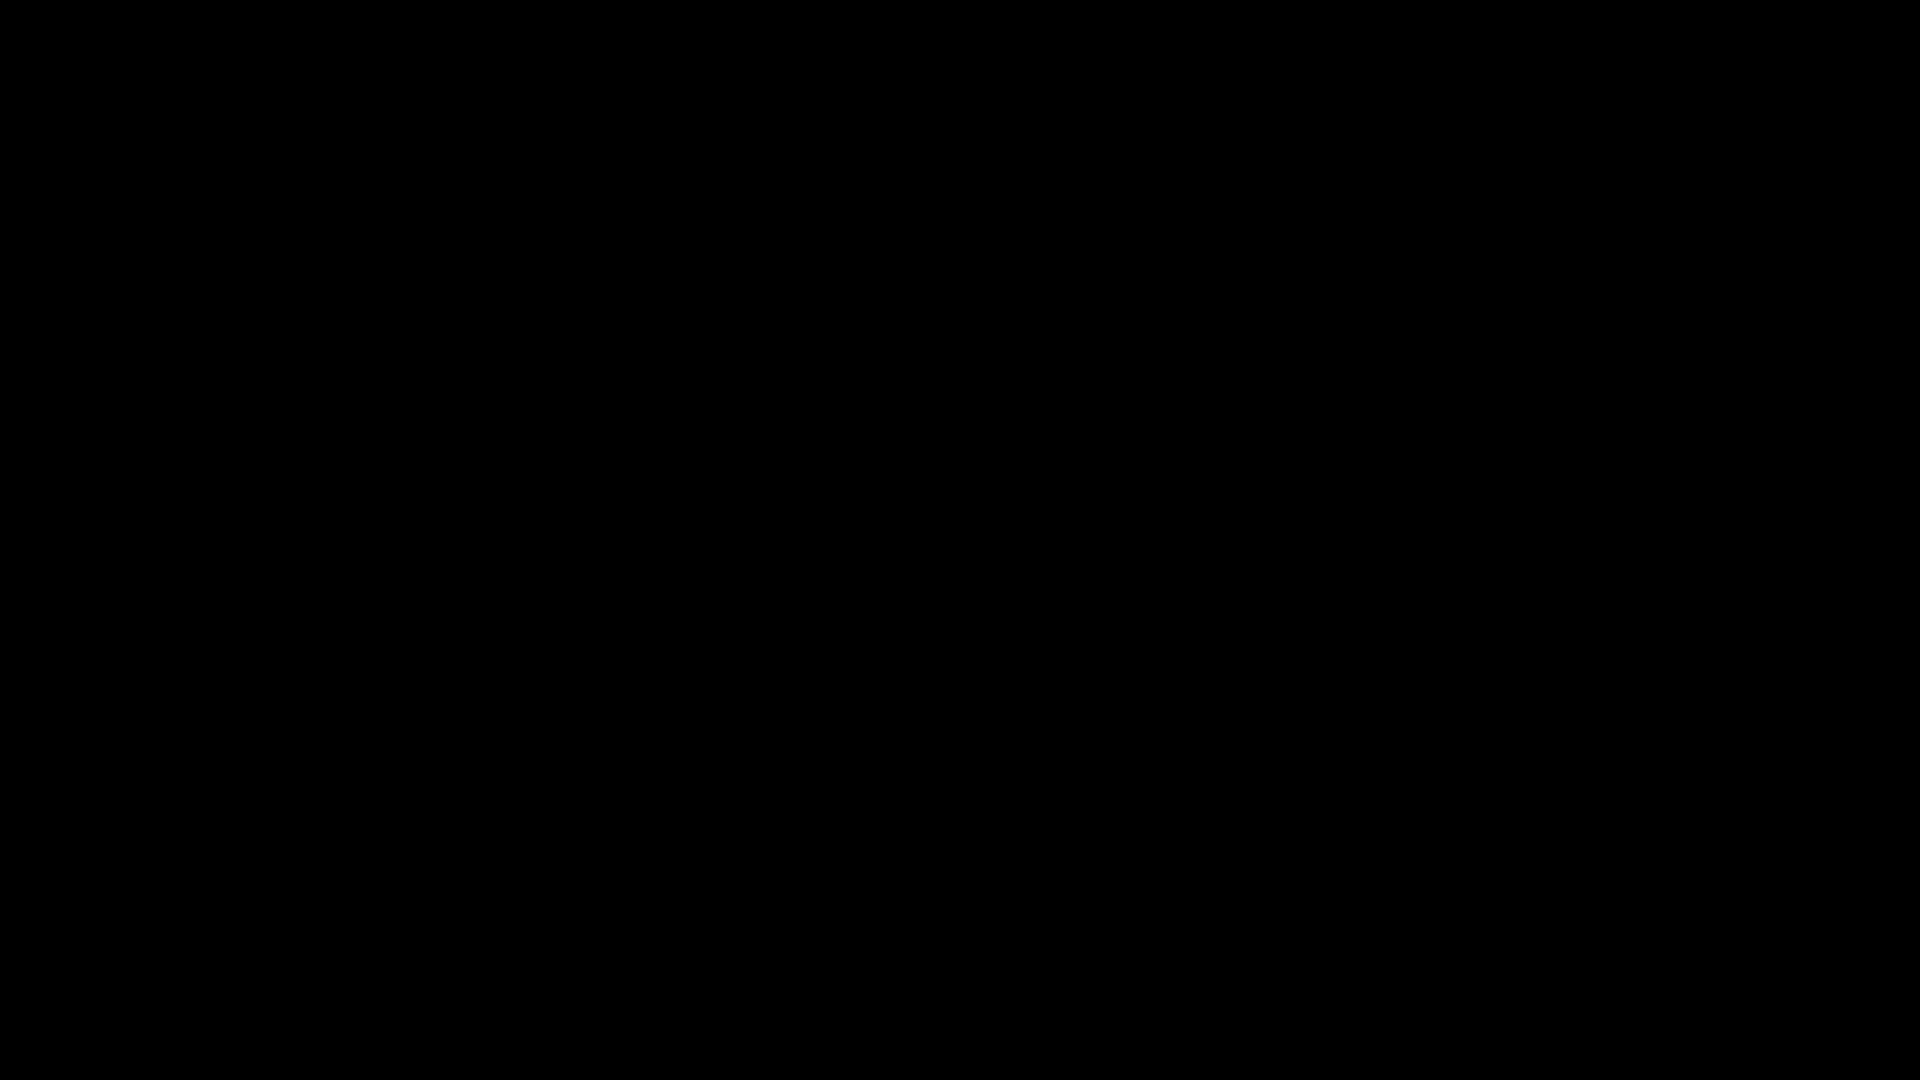 925 चांदी diy गहने तांबे स्टार सीप मोती मनका पिंजरे पेंडेंट हार